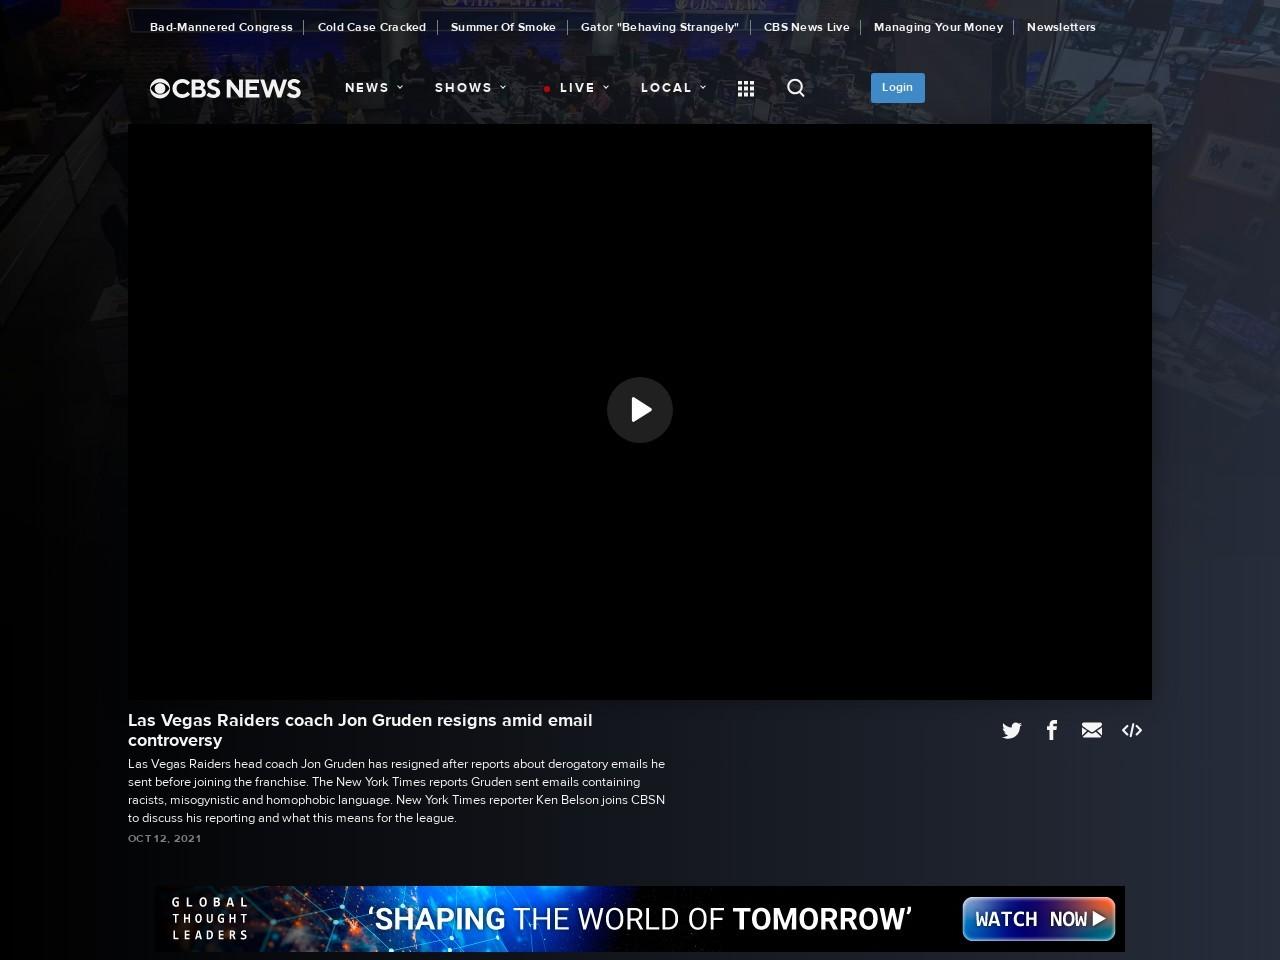 Las Vegas Raiders coach Jon Gruden resigns amid email controversy